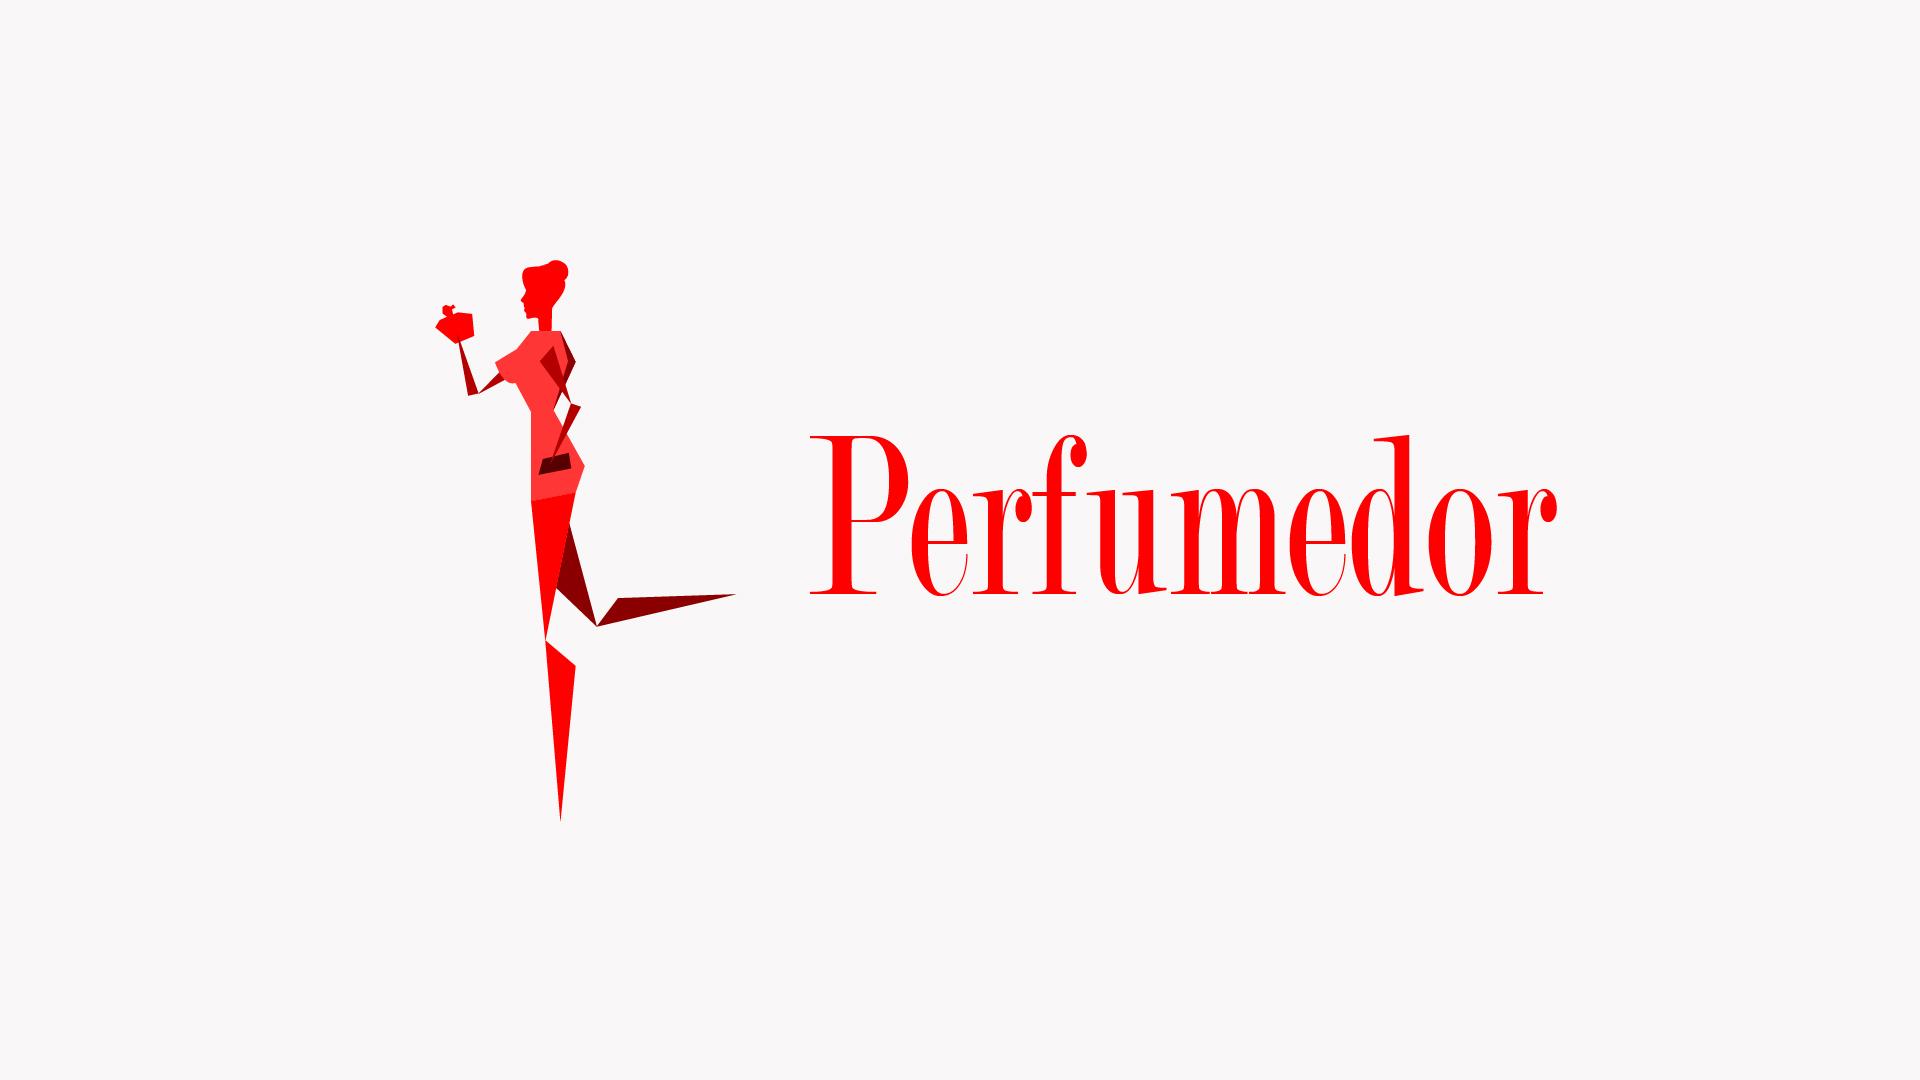 Логотип для интернет-магазина парфюмерии фото f_0465b44a27f348d6.jpg